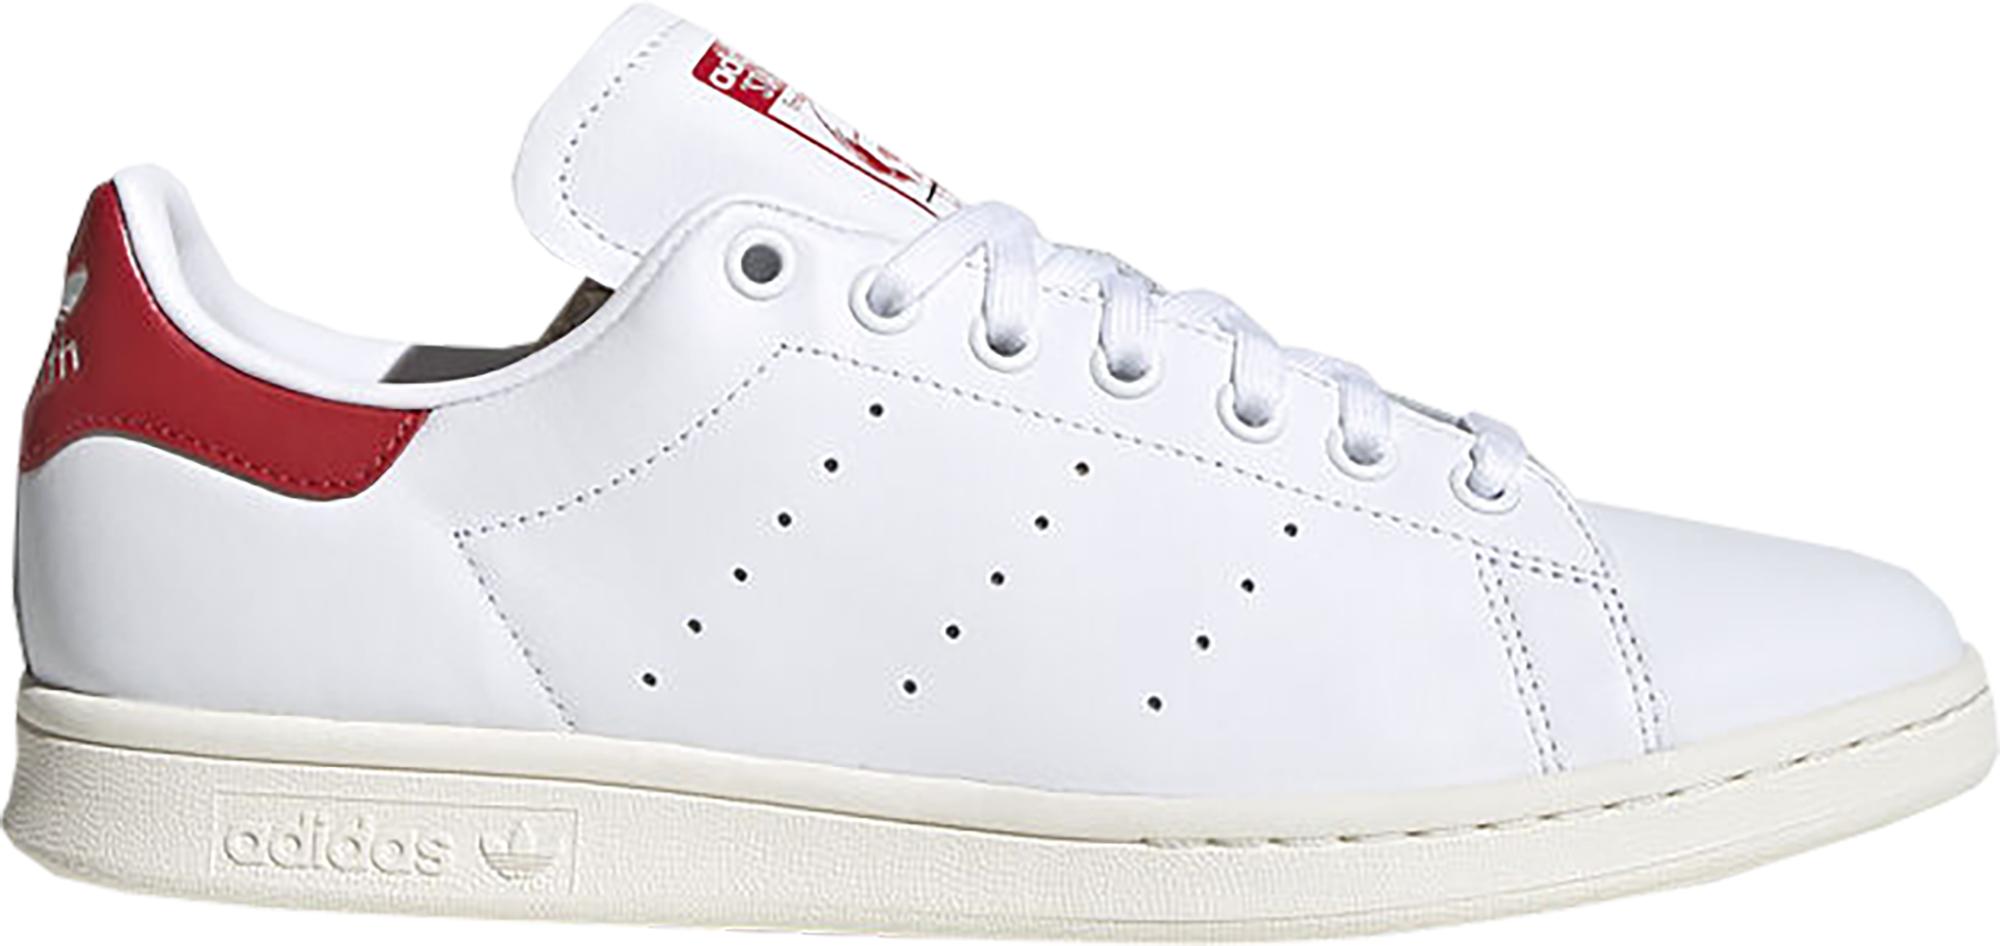 stan smith shoes valentine